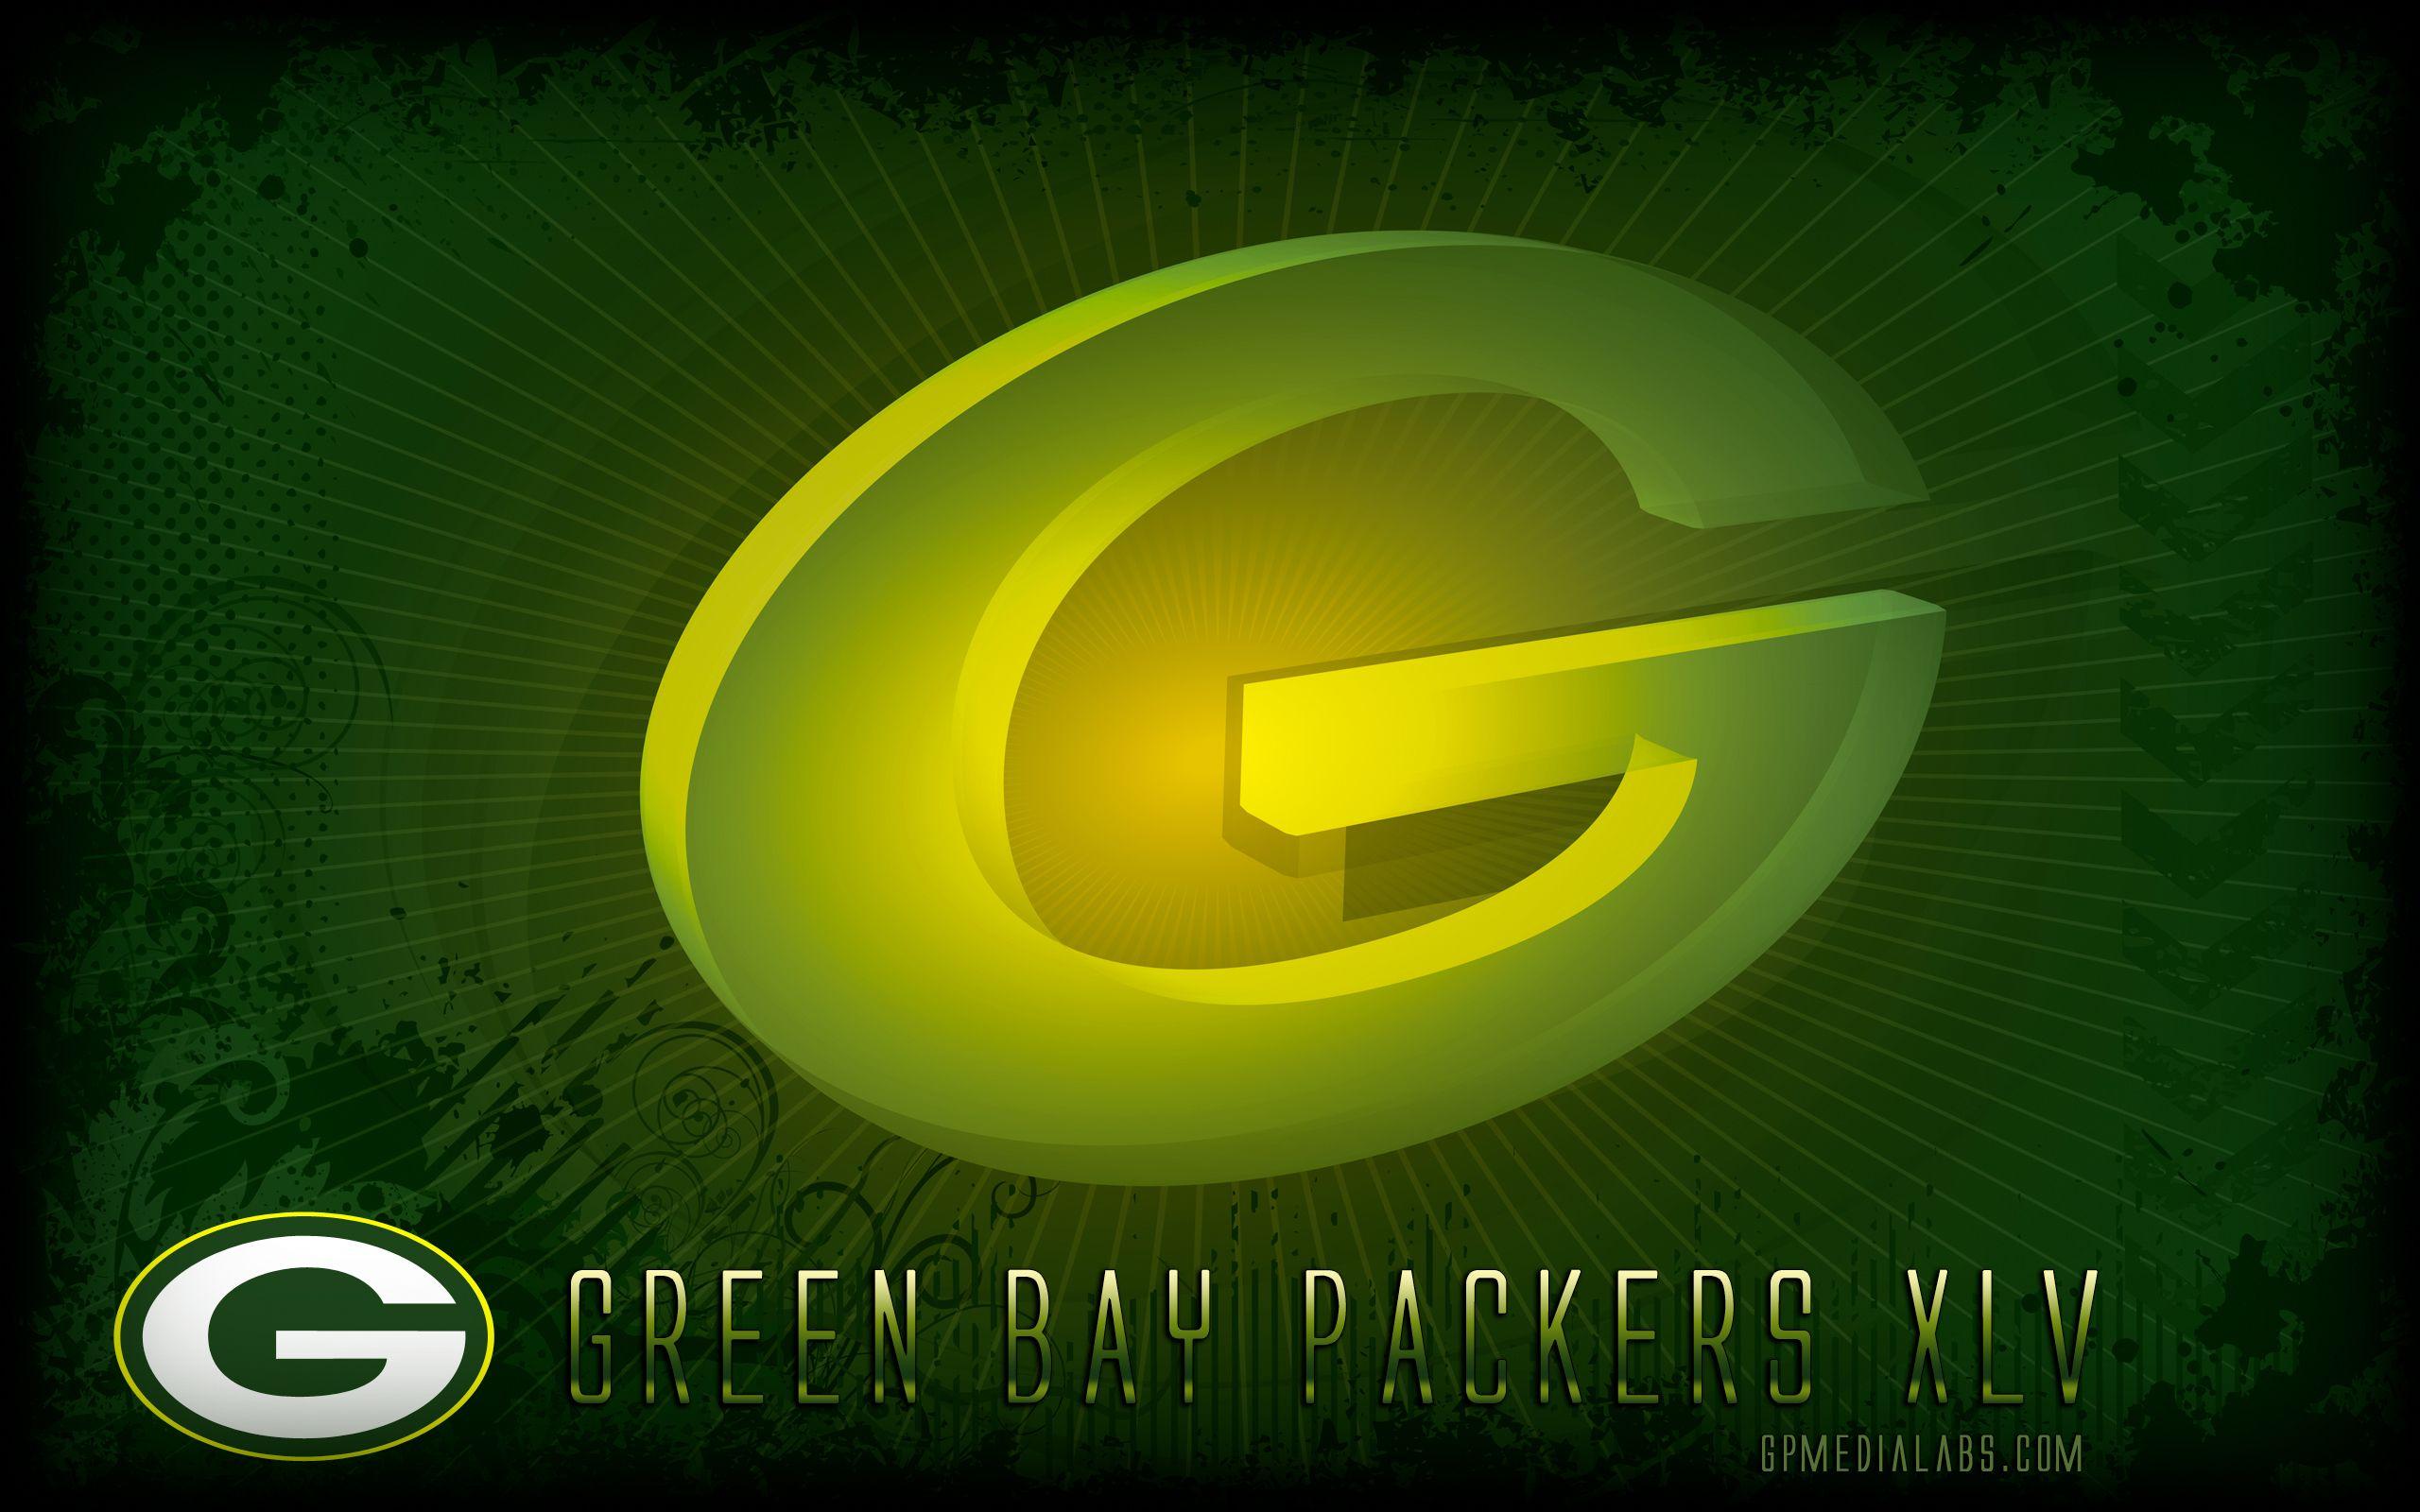 Green Bay Packers Wallpaper Green Bay Packers Wallpaper Green Bay Packers Green Bay Packers Clothing